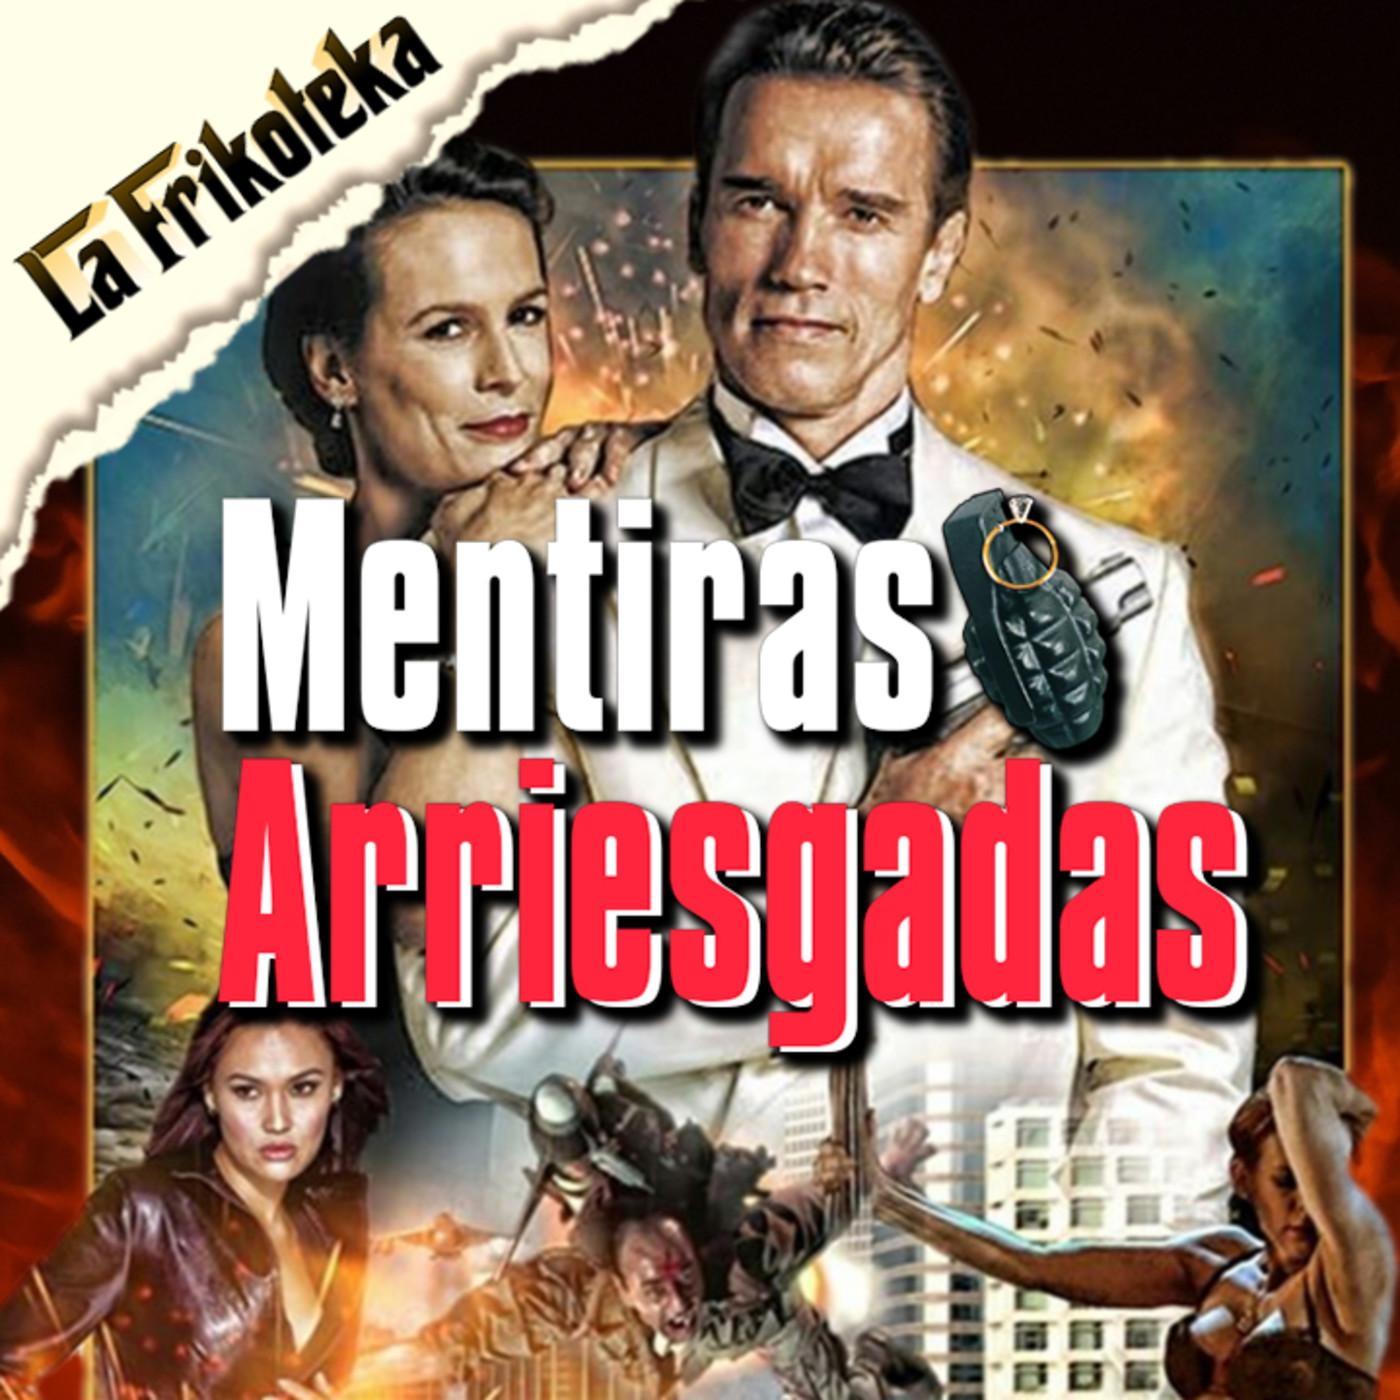 091 - Mentiras Arriesgadas (1994)